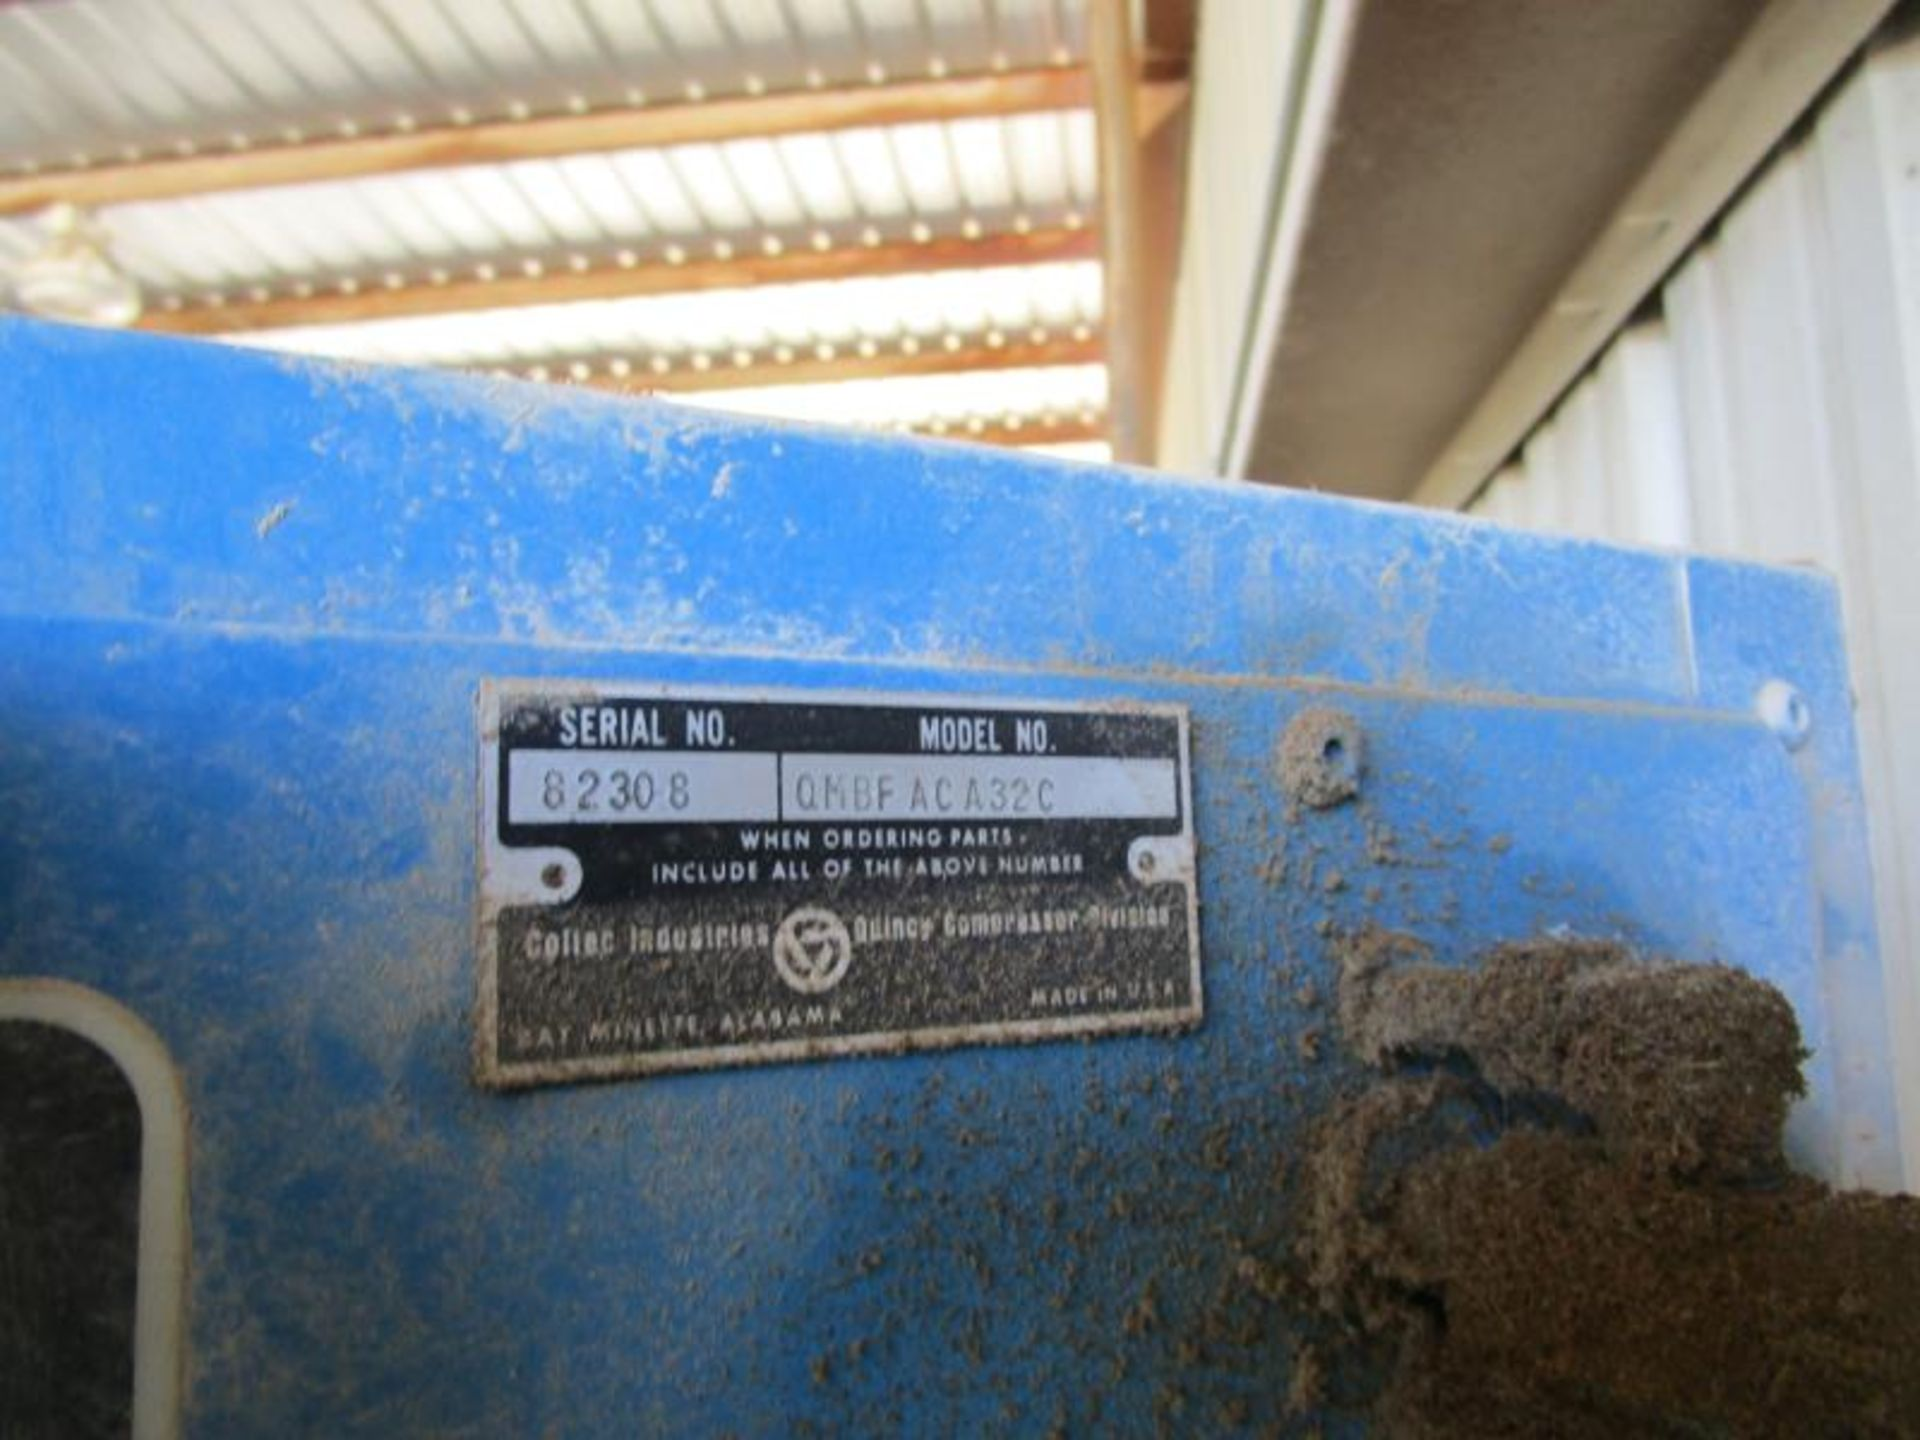 Lot 17 - Quincy Air Compressor, 19985 hours, m: QMBFACA32C SN:82308 w/ Great Lakes Regenerative Air Dryer